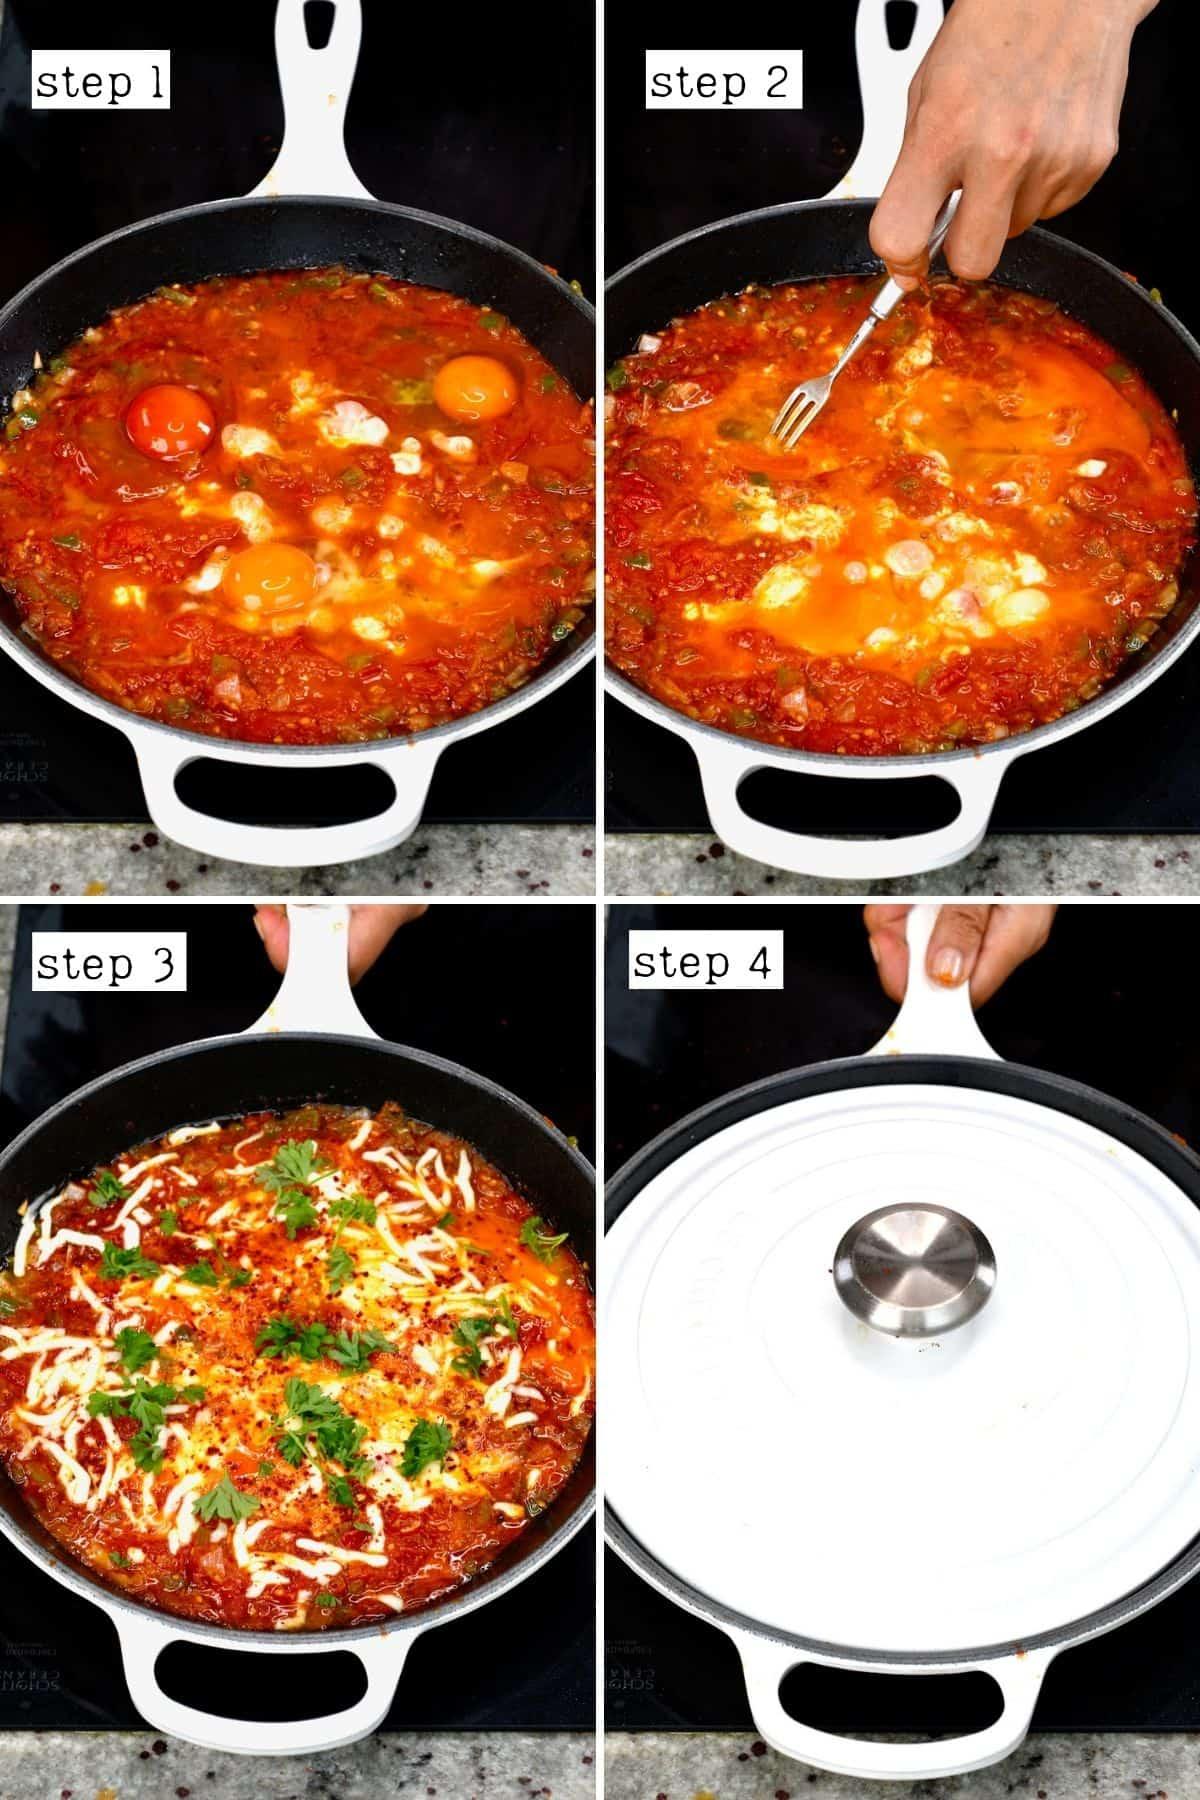 Steps for cooking menemen